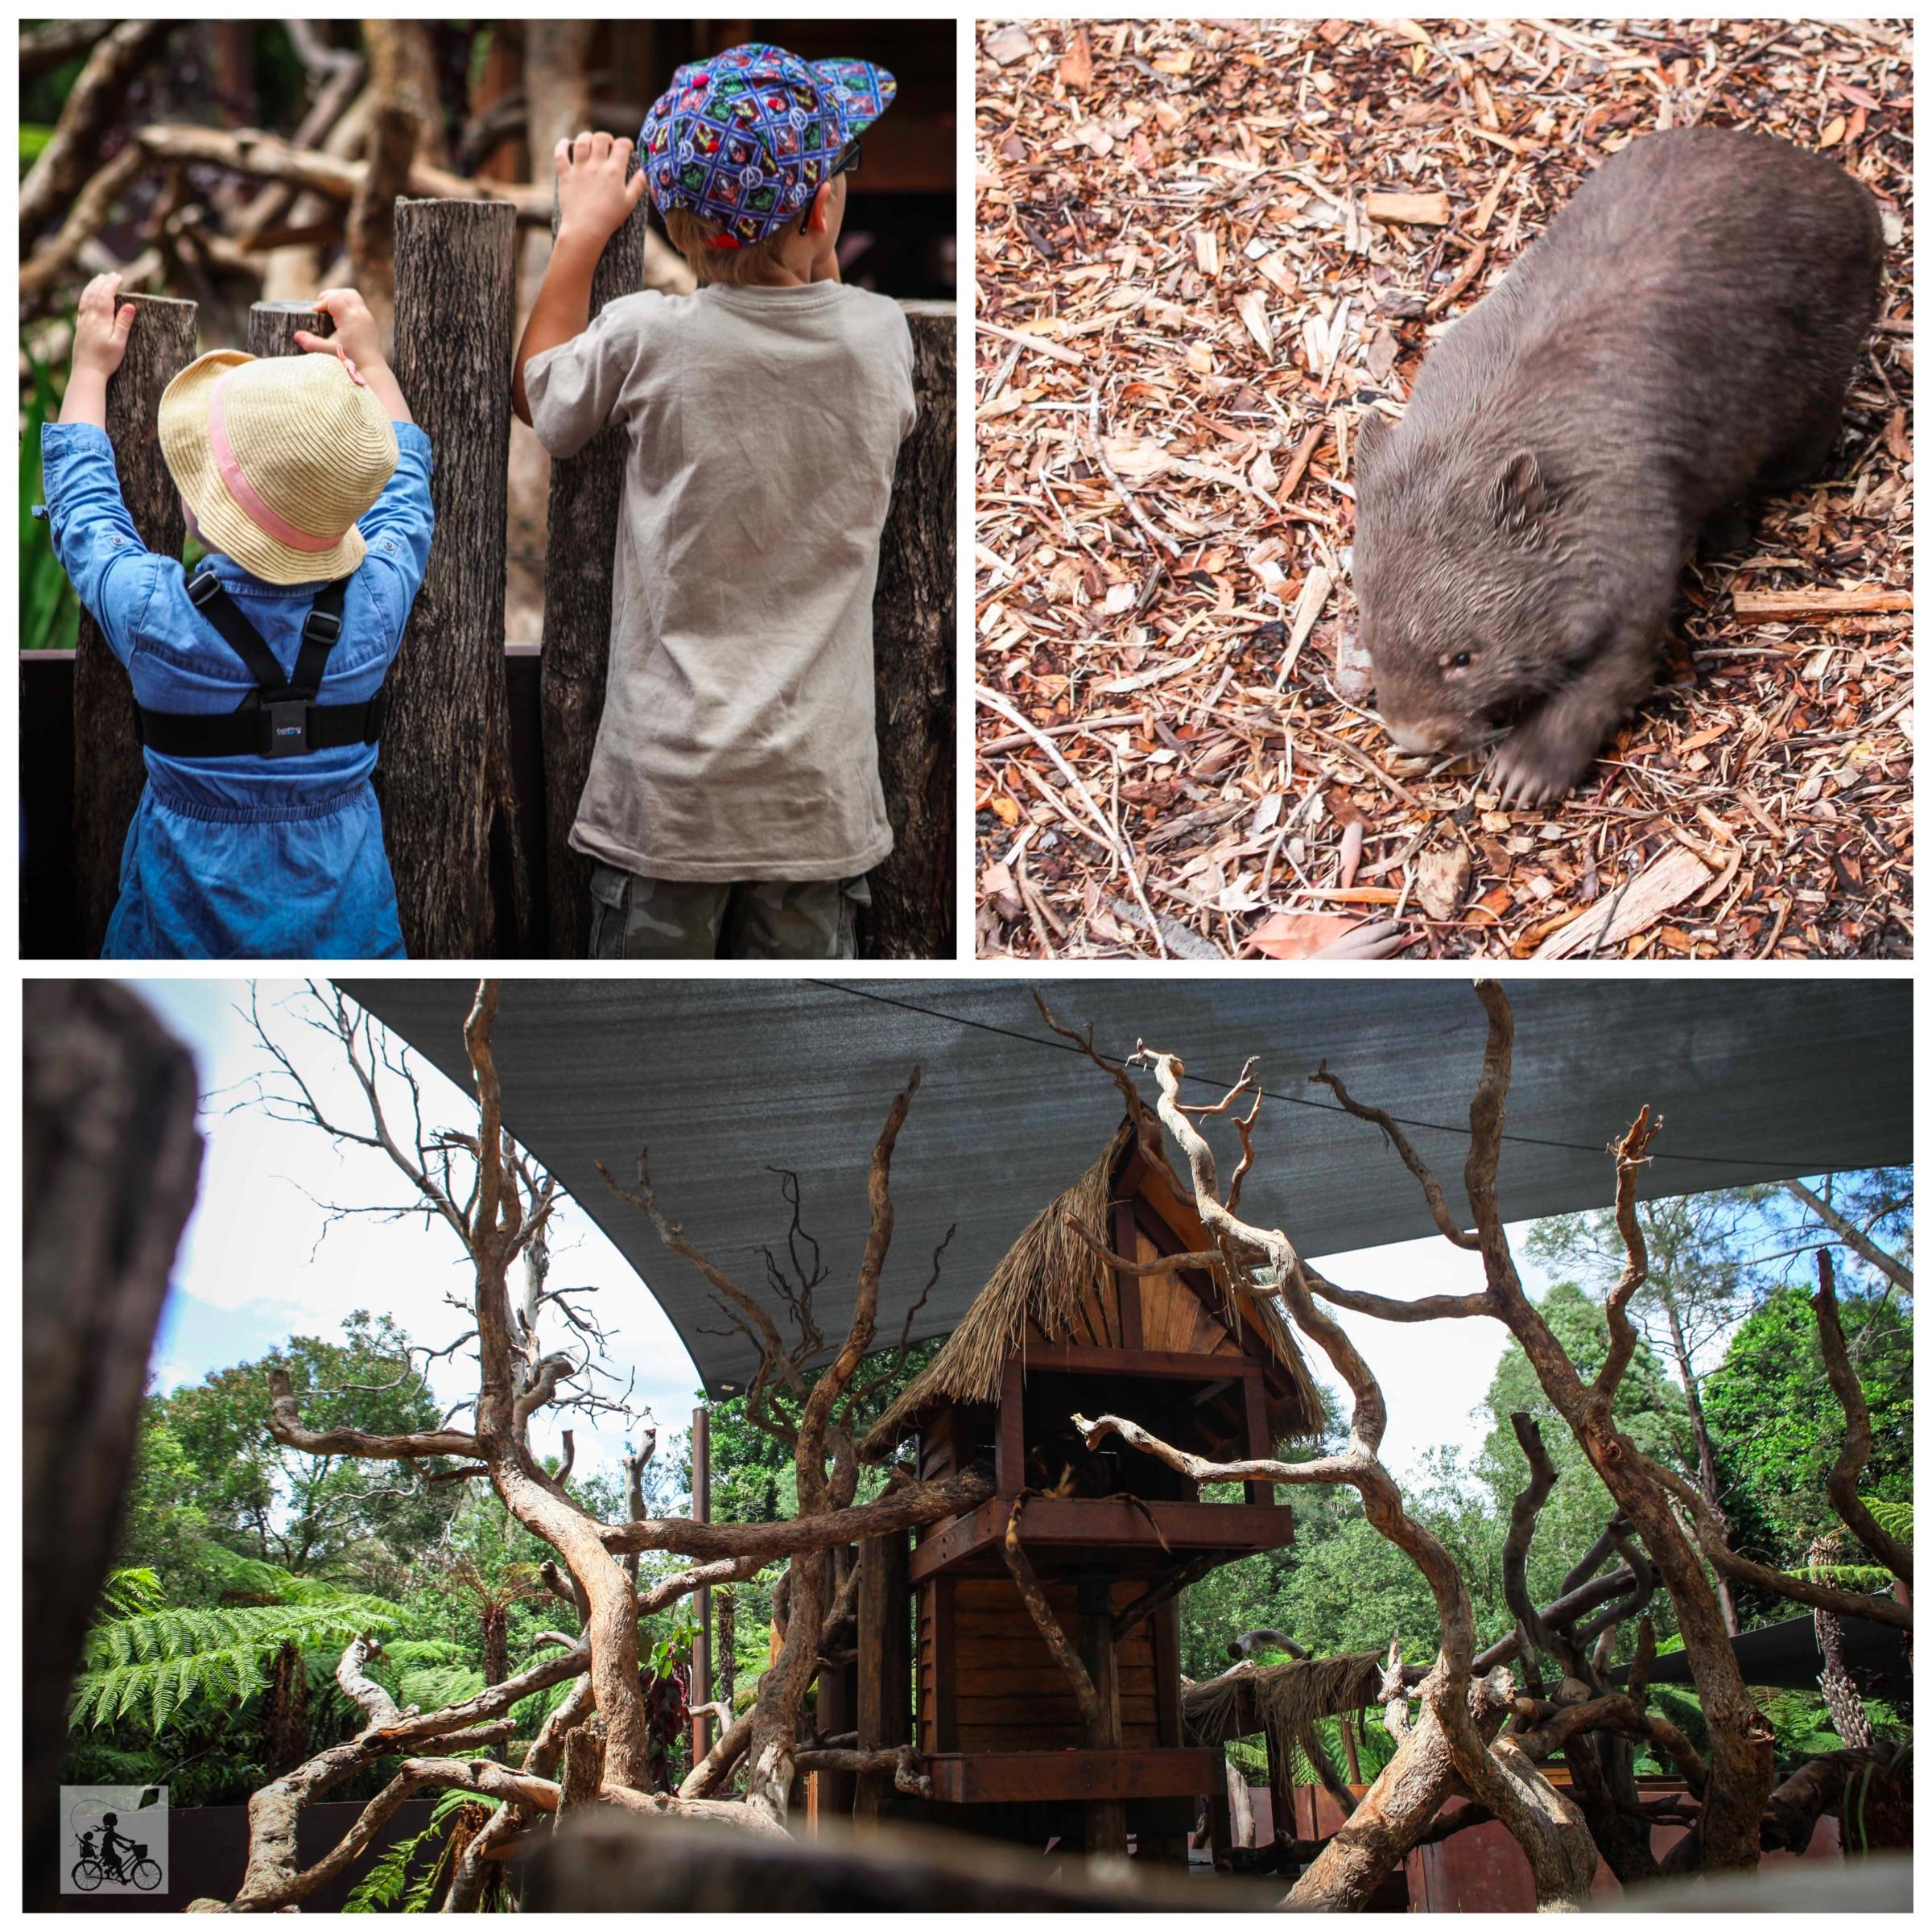 Mamma Knows East - Healesville Sanctuary Kangaroo Country 3.jpg